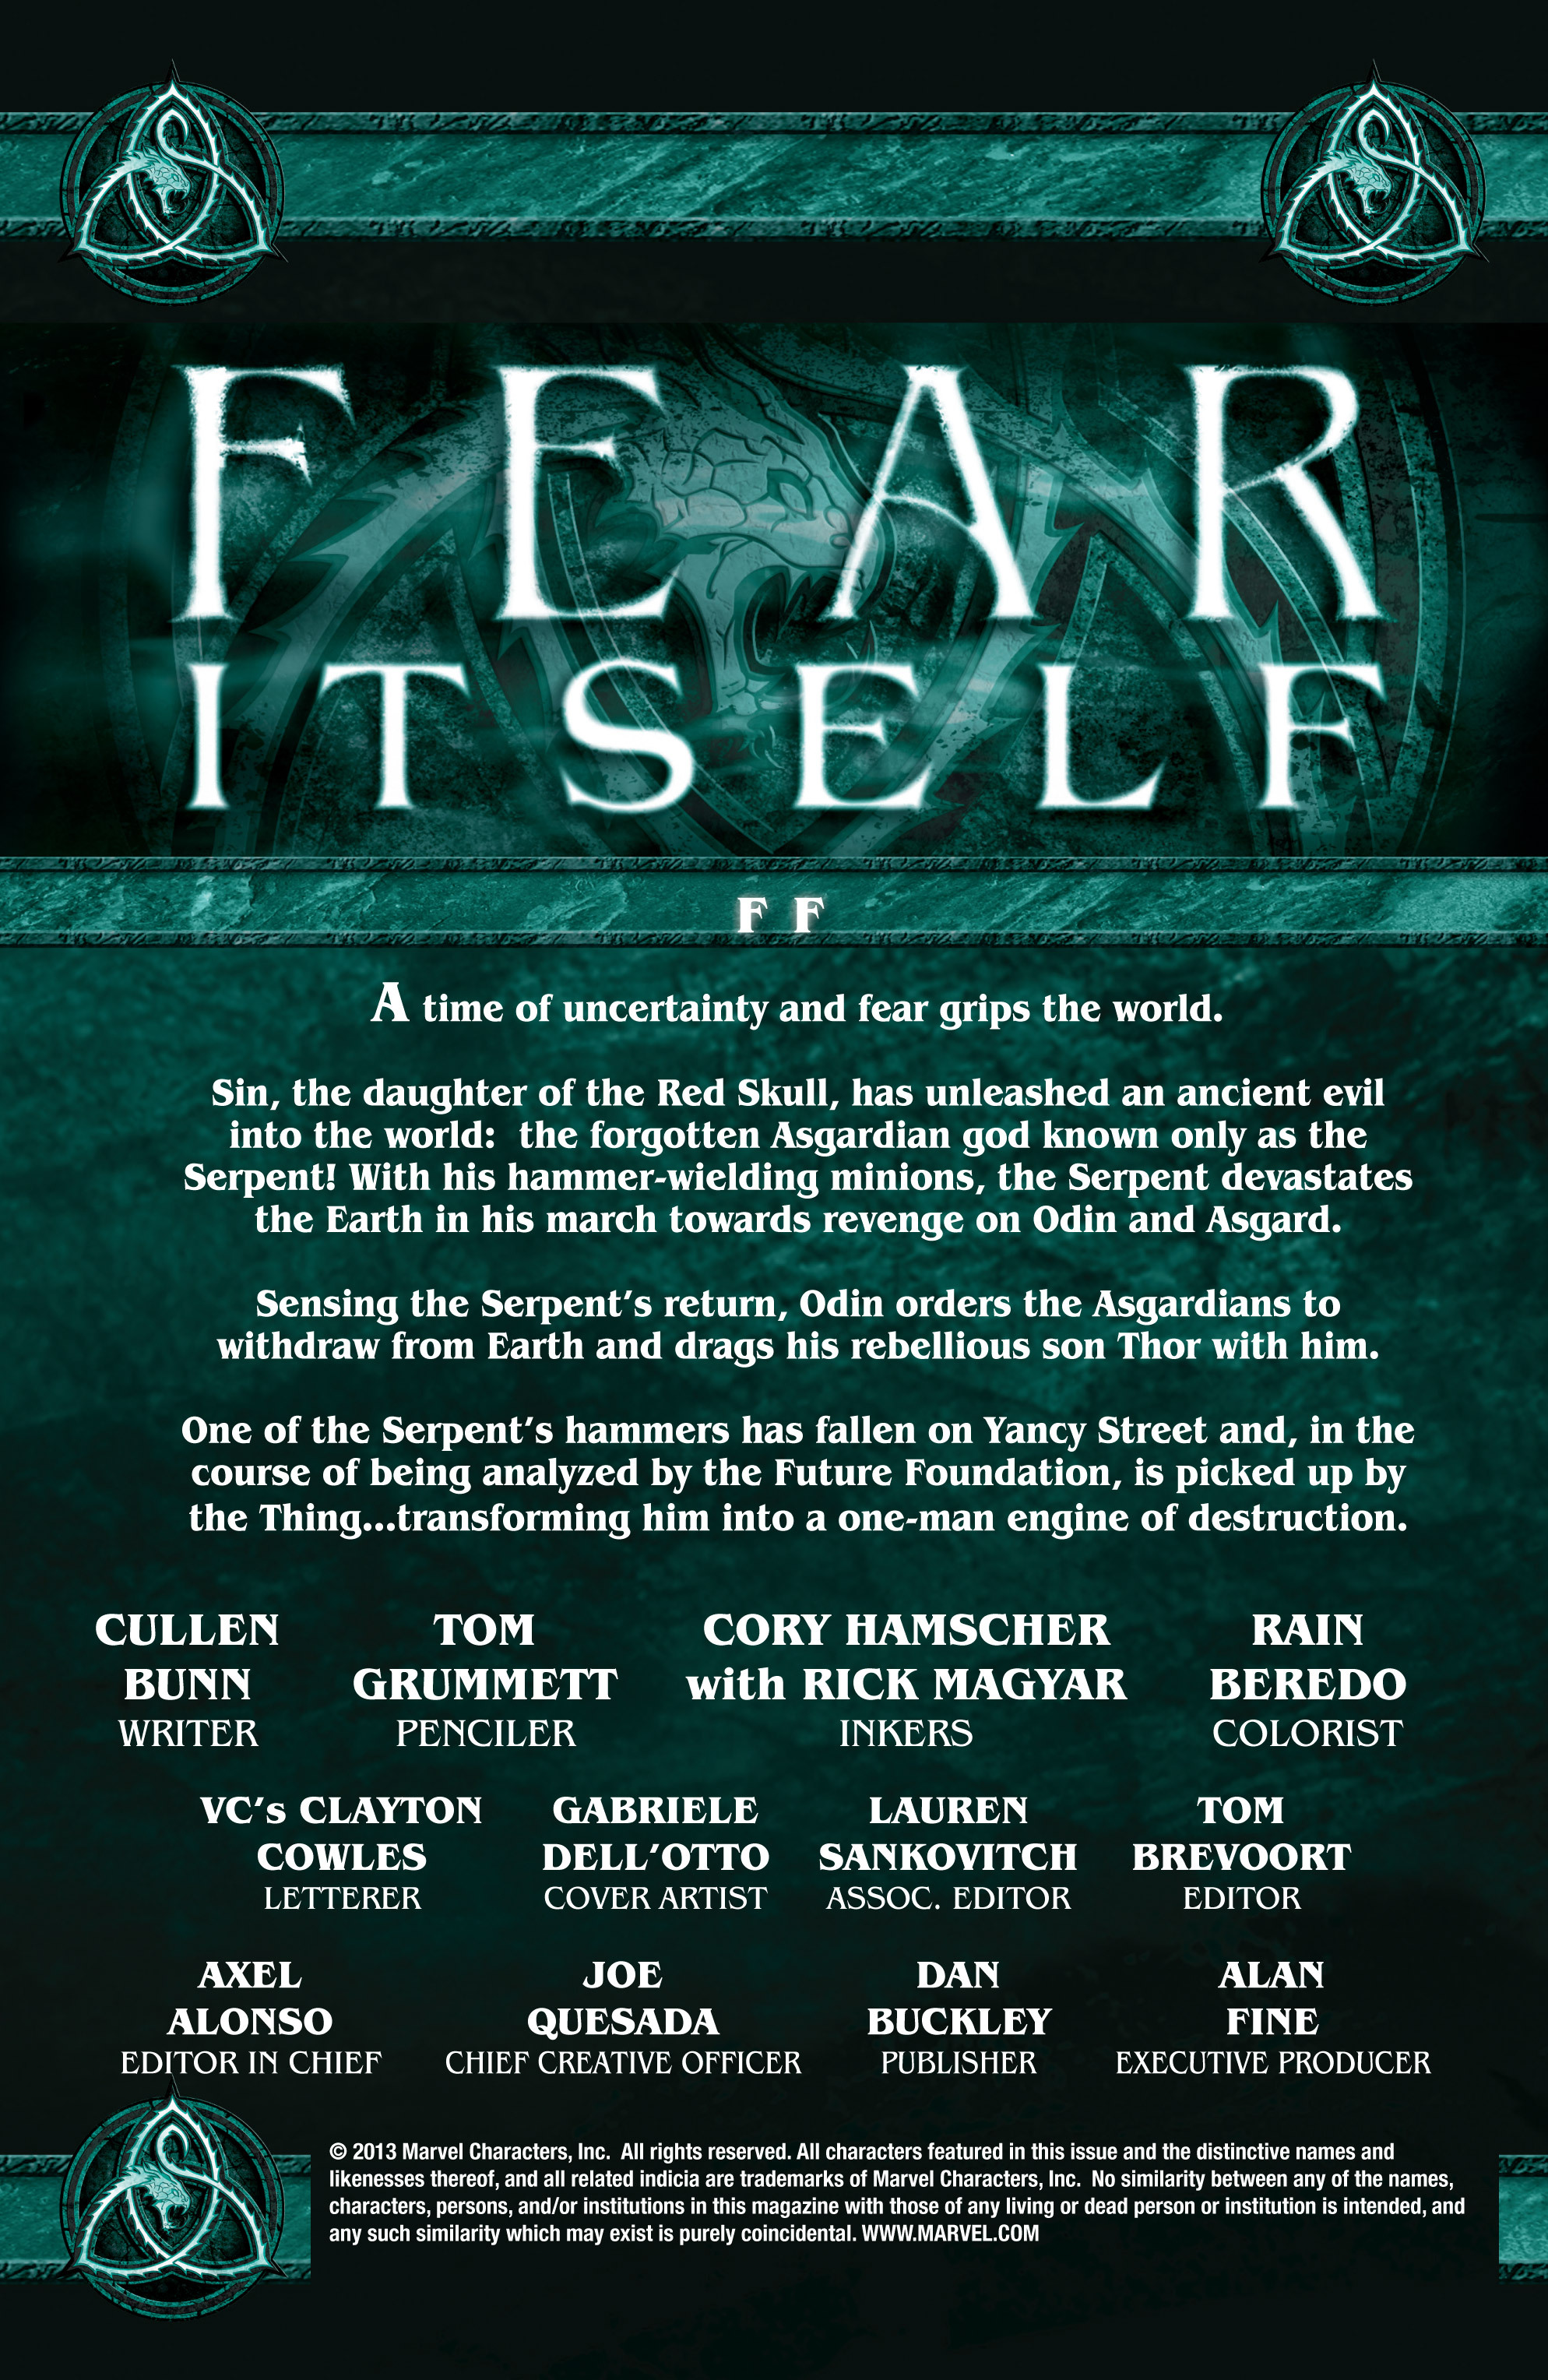 Read online Fear Itself: FF comic -  Issue # Full - 2